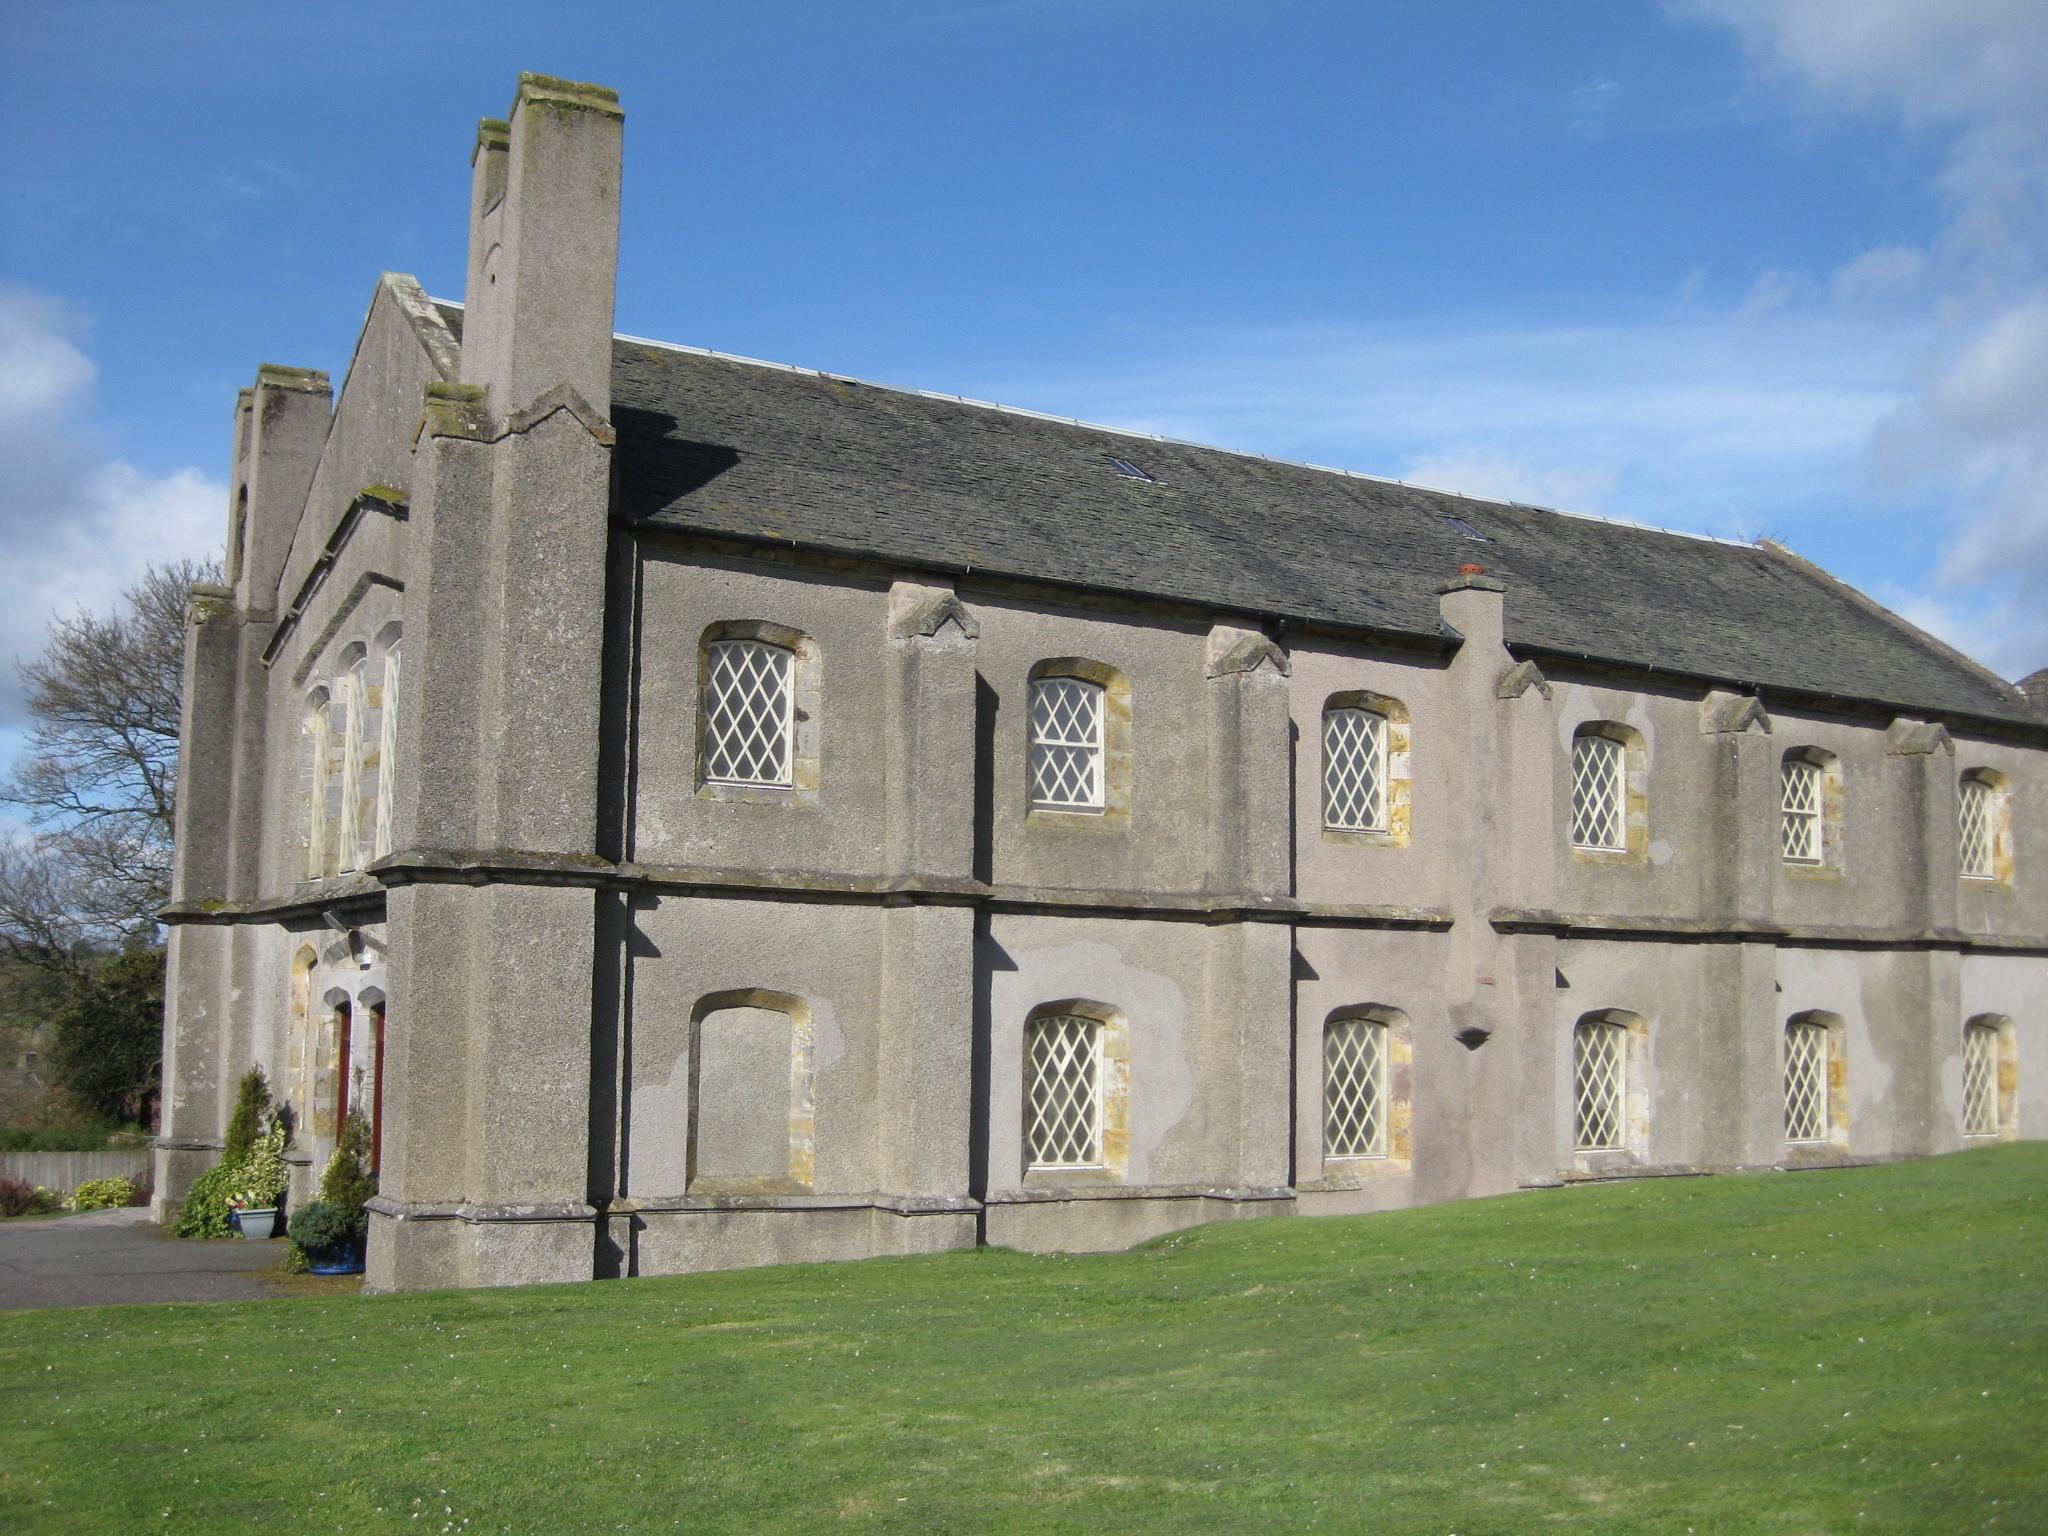 Saline & Blairingone Parish Church, Saline, Fife, Scotland